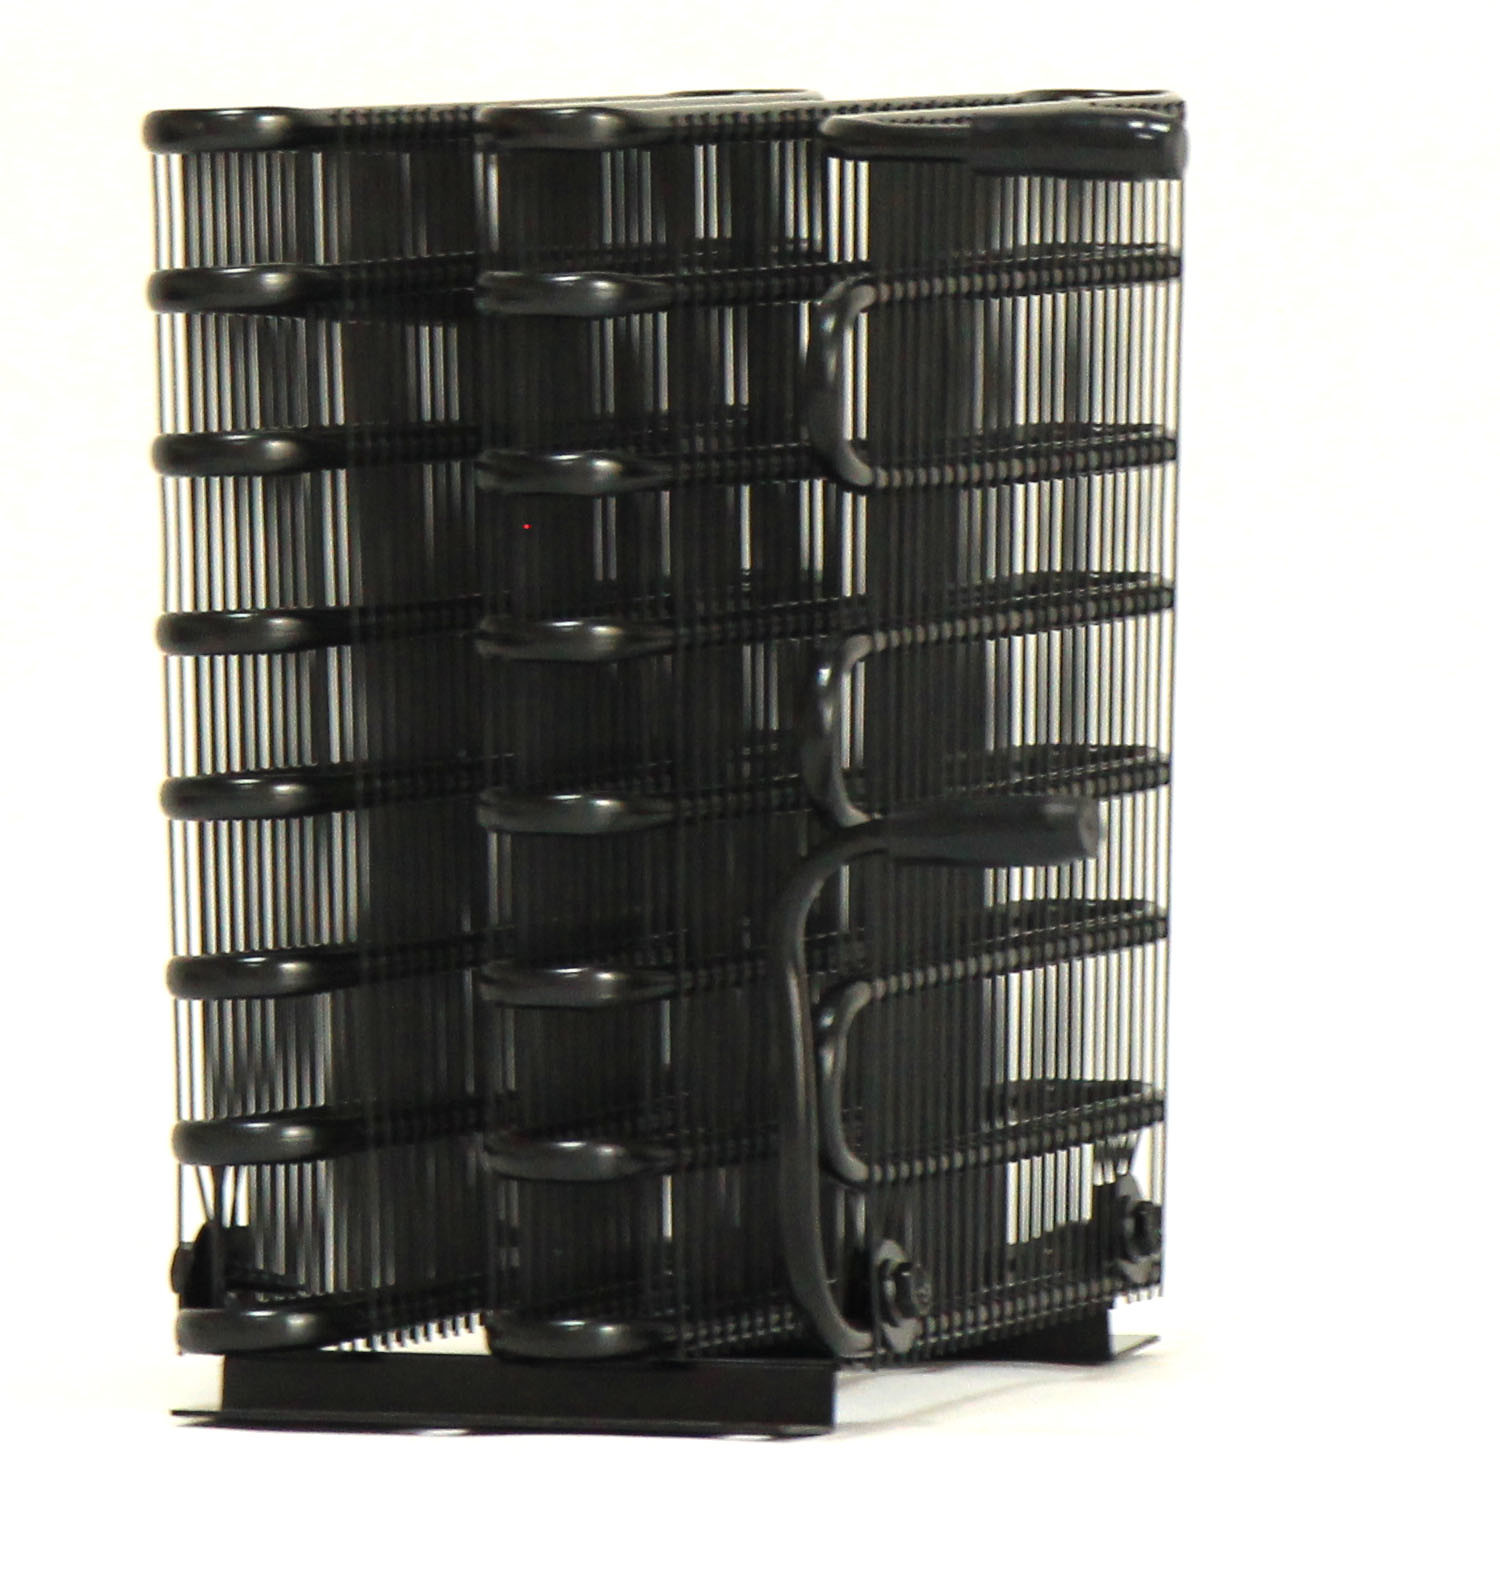 Condenser, Evaporator, Heat Exchanger, Refrigeration Part for Freezers Equipment etc.